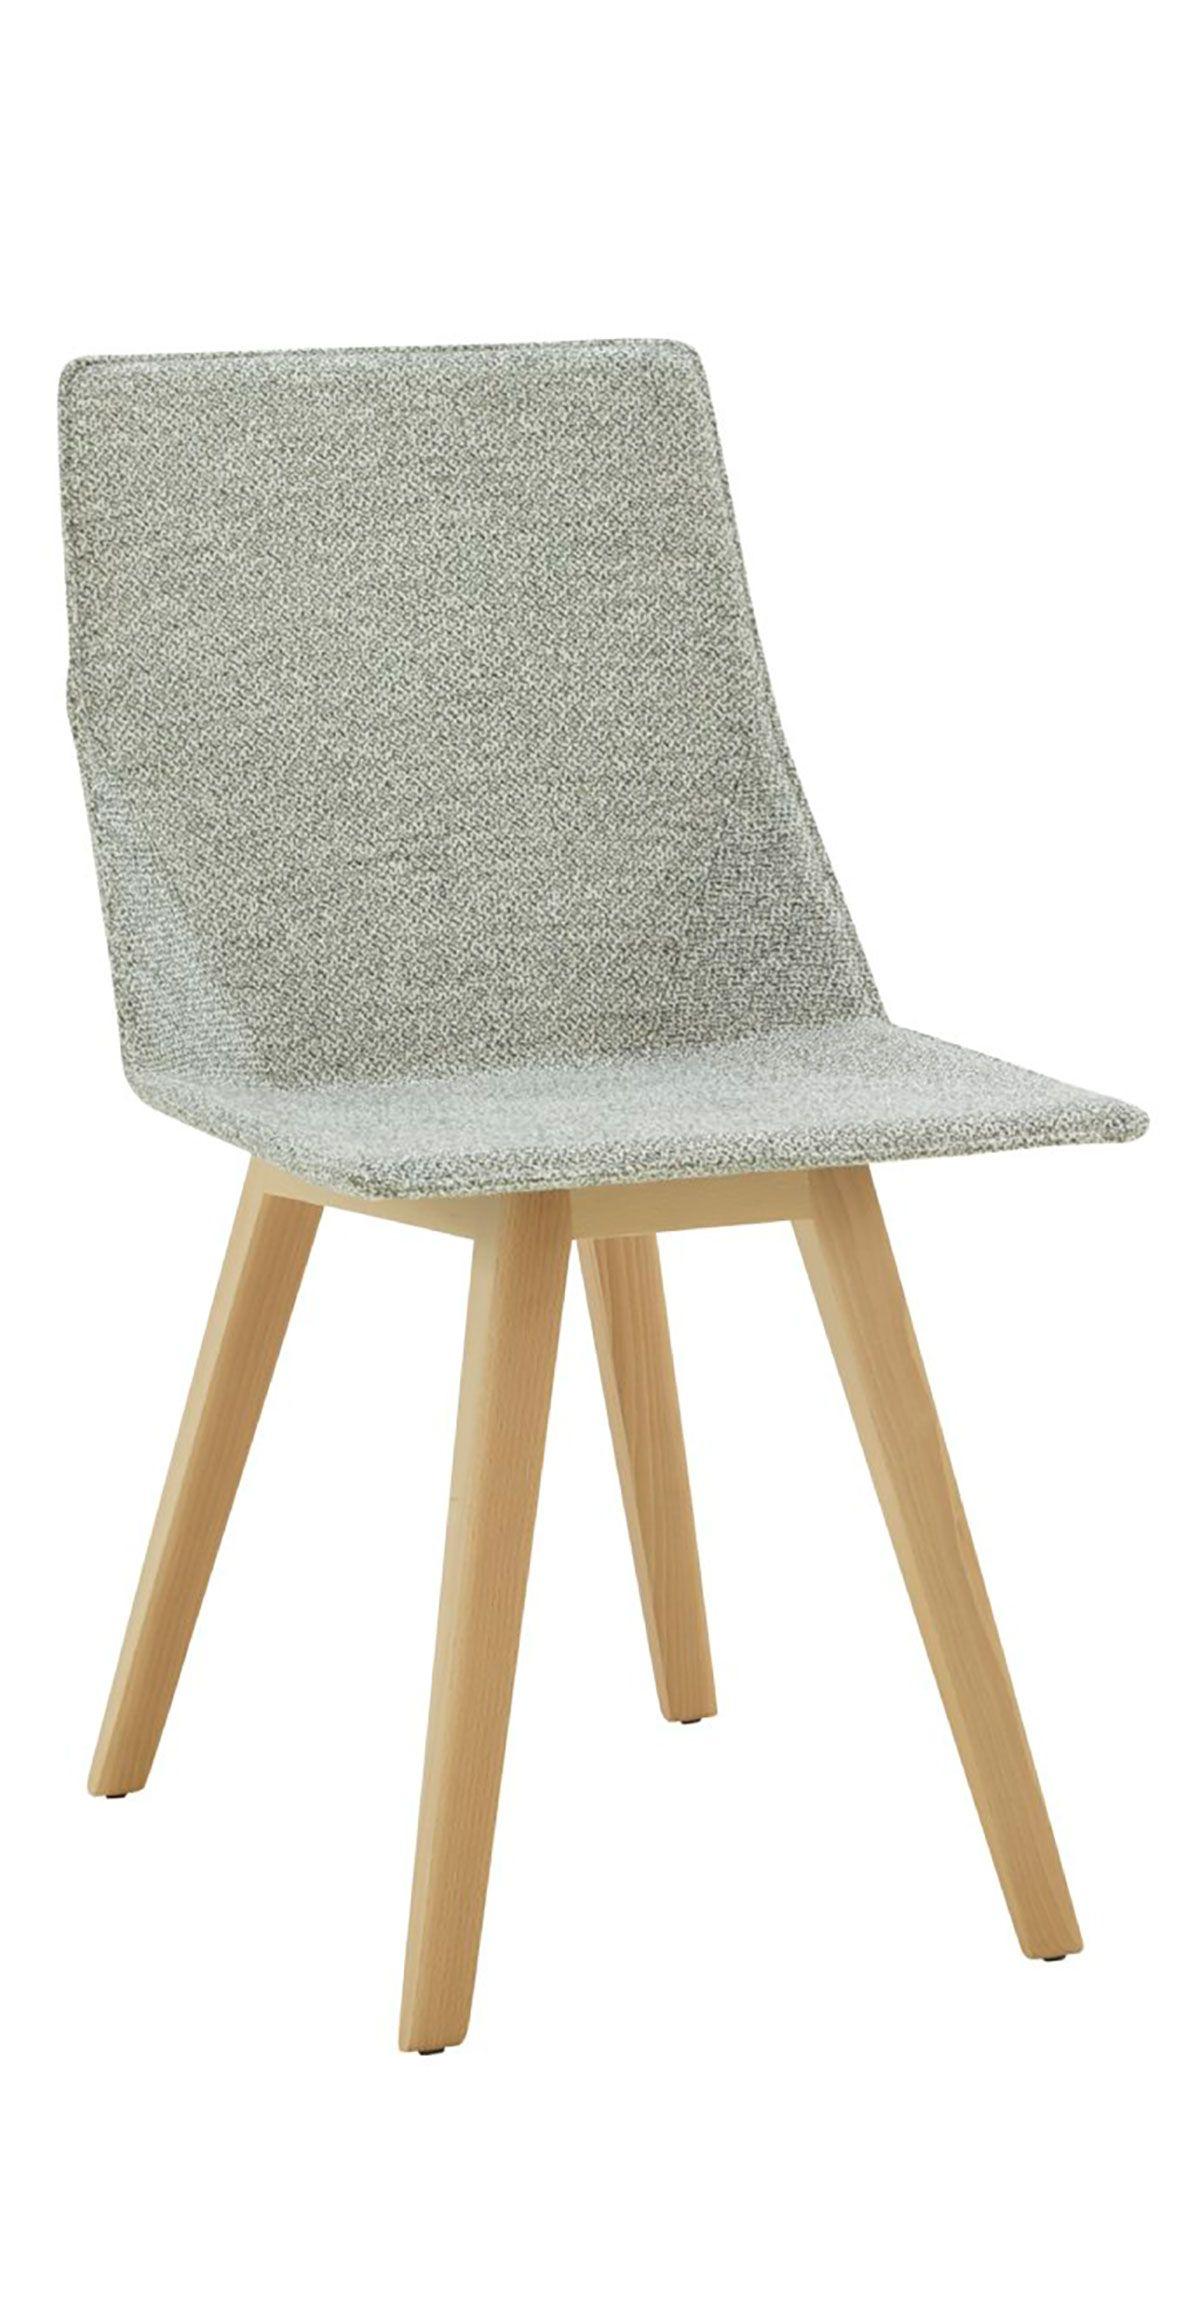 Elsa Dining Chair, Designed By Francois Bauchet For Ligne Roset | Available  At Linea Inc